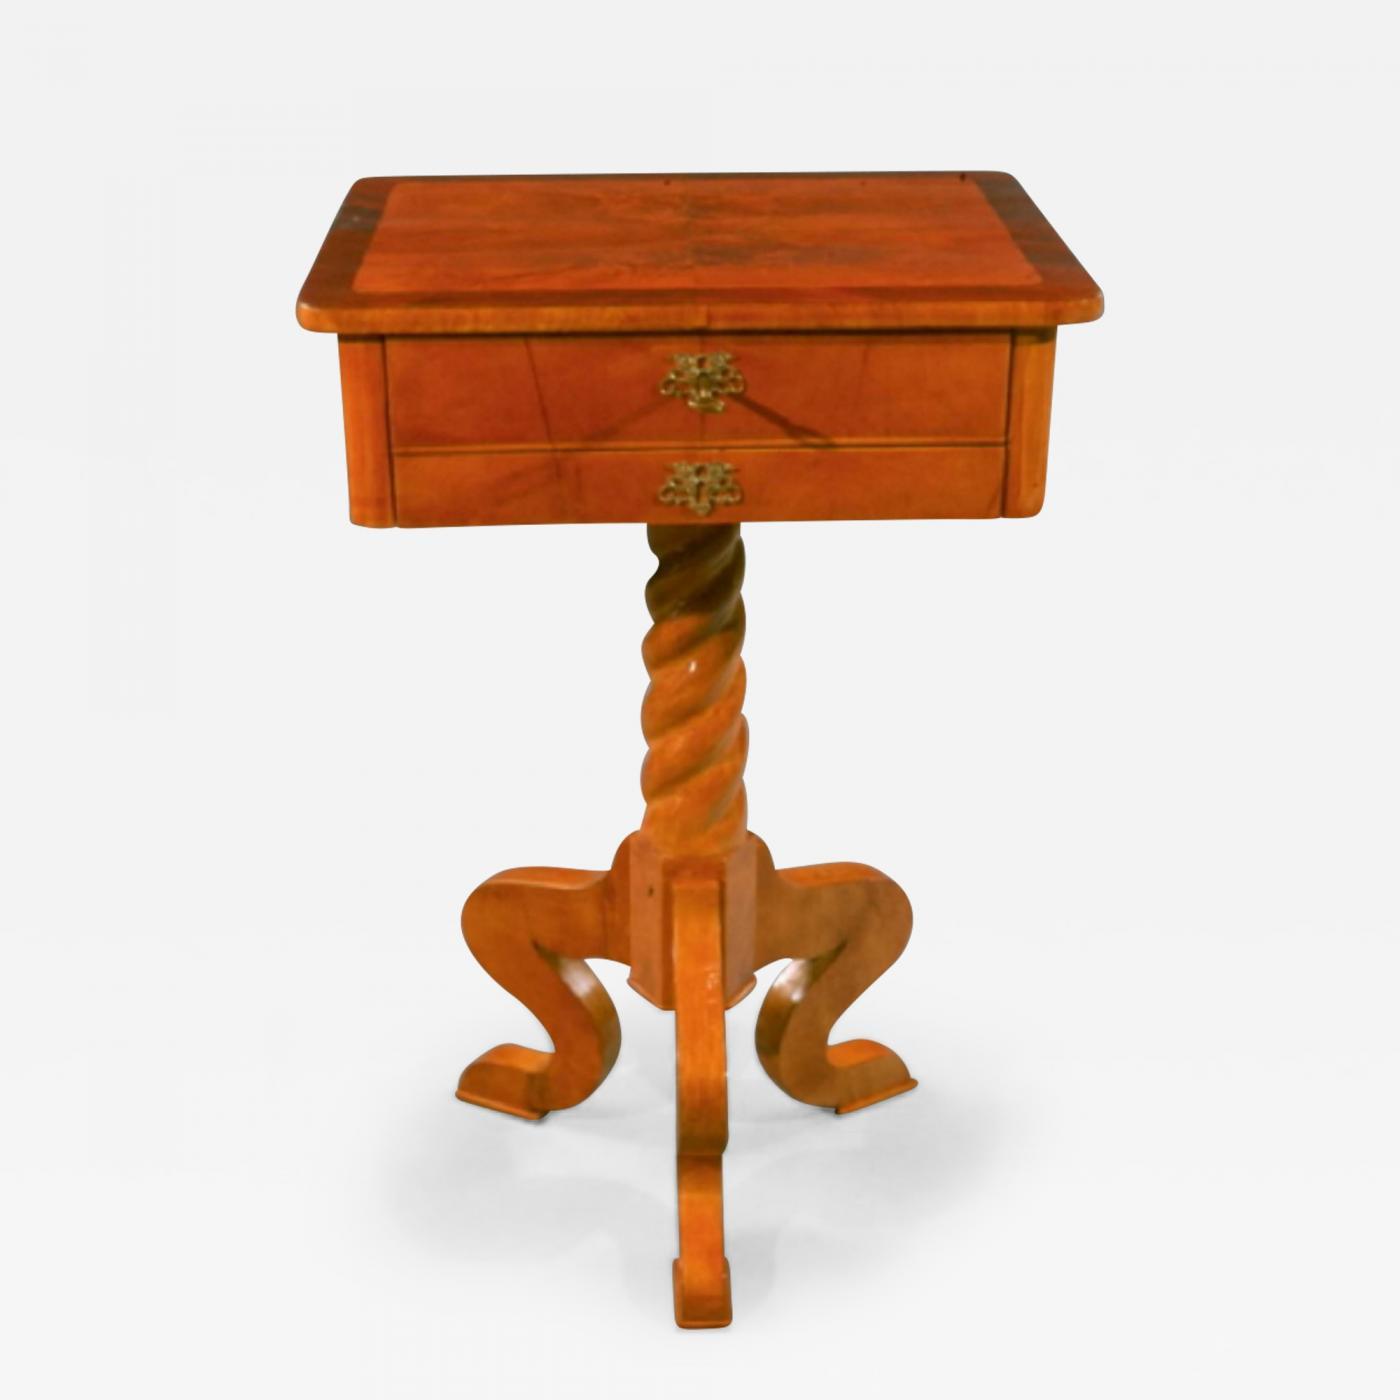 A Second Rococo Occasional Table - Rococo side table